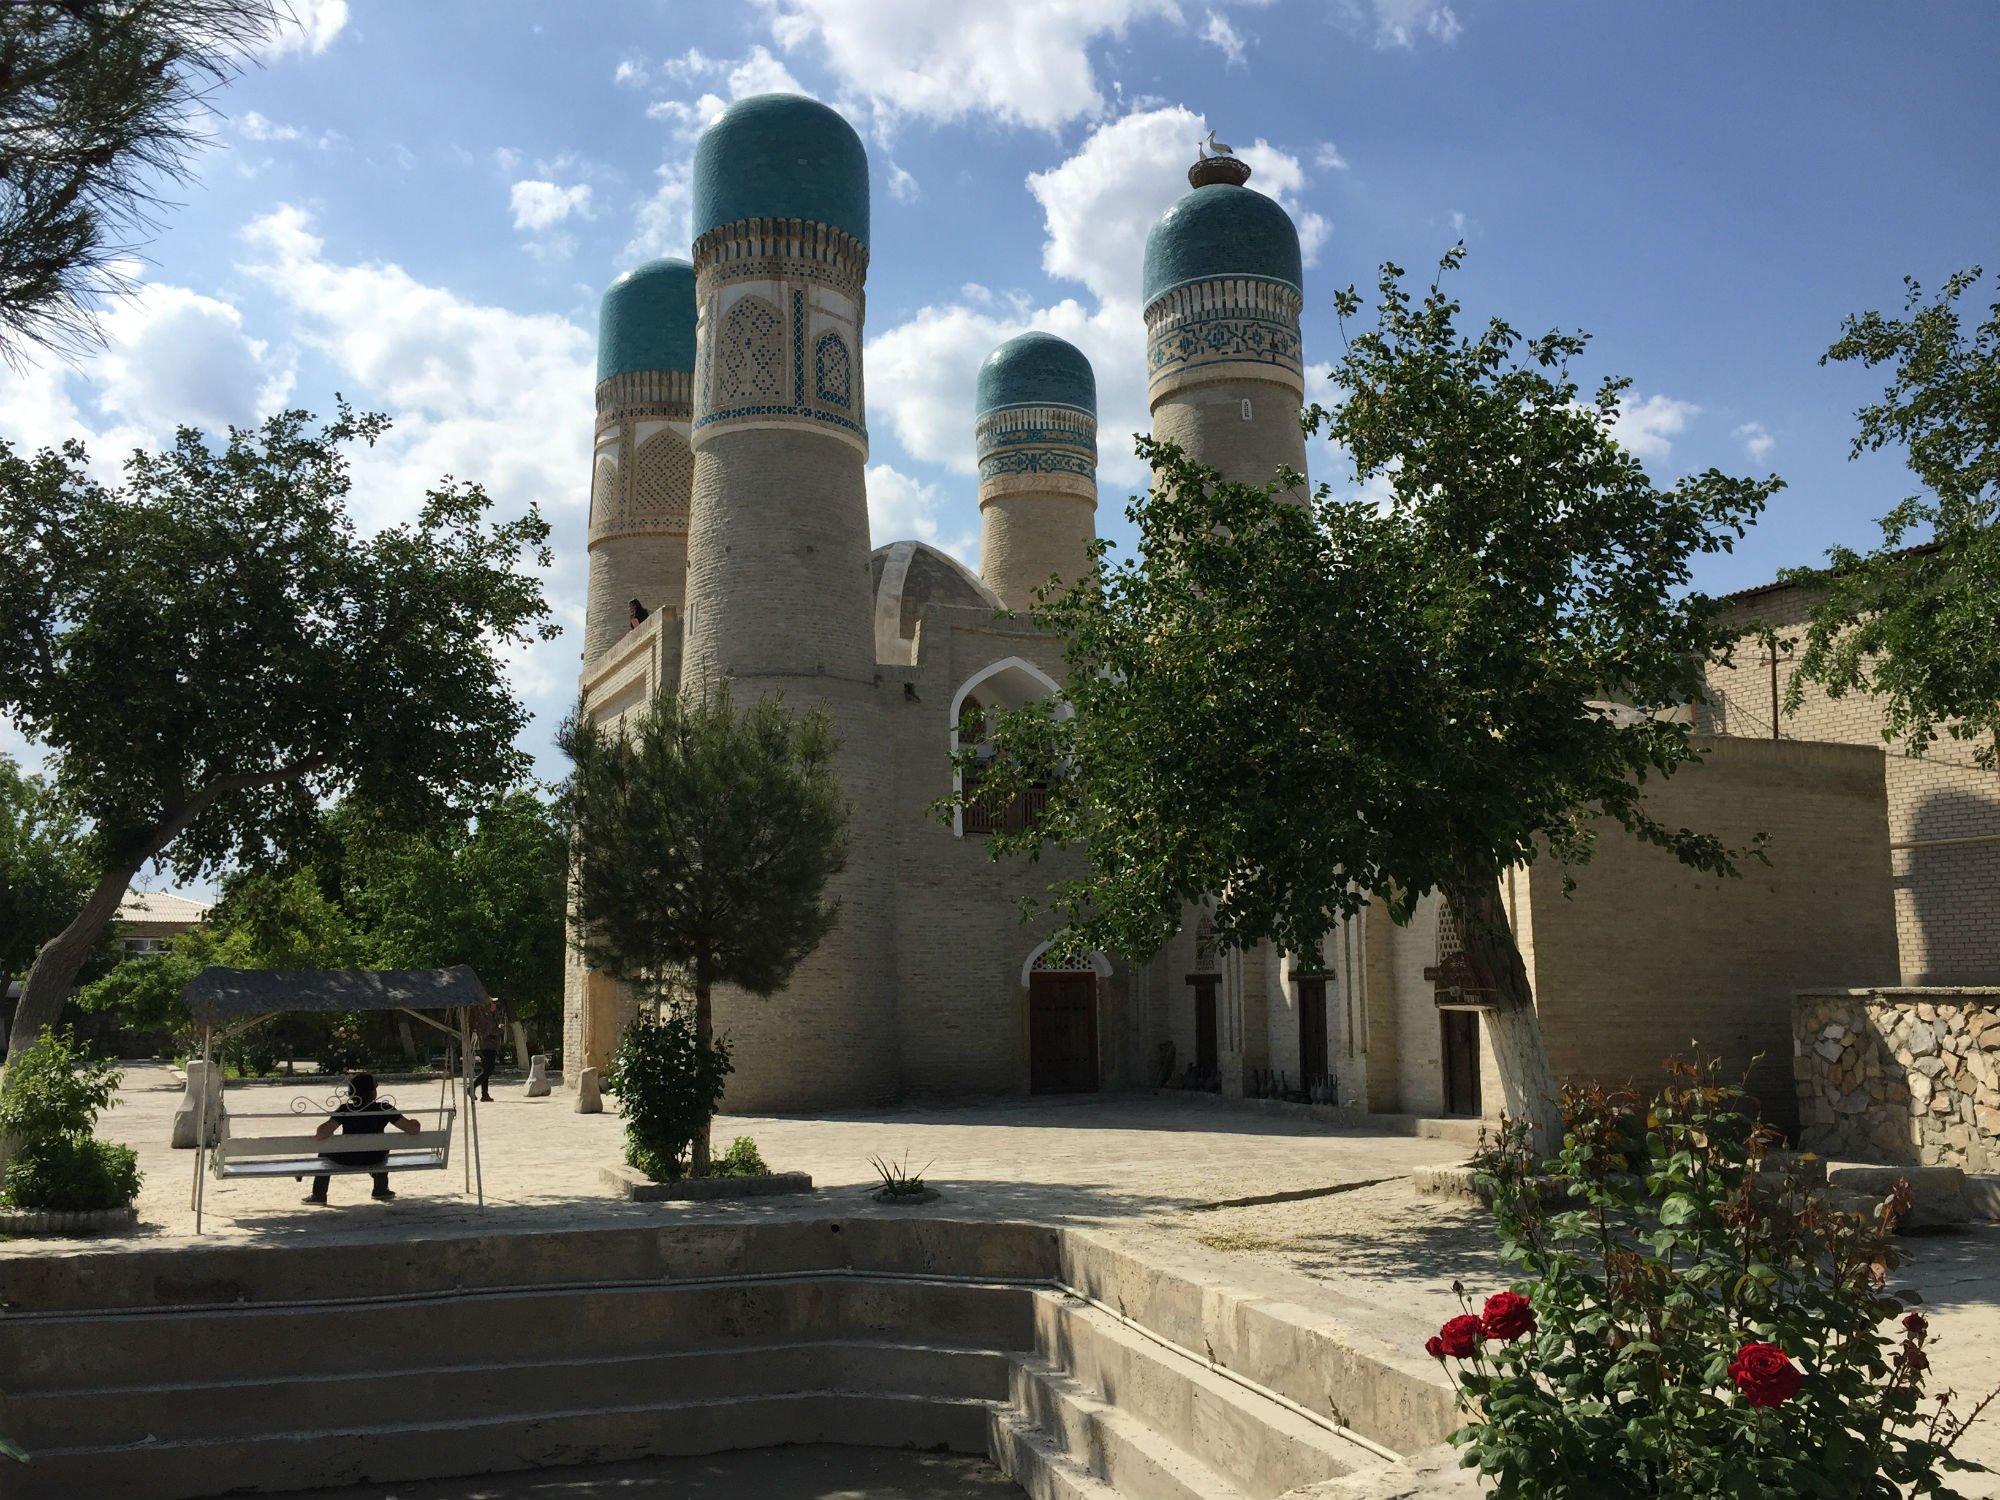 UZBEKISTAN Bukhara Chor Minor VIAGGIO IN UZBEKISTAN